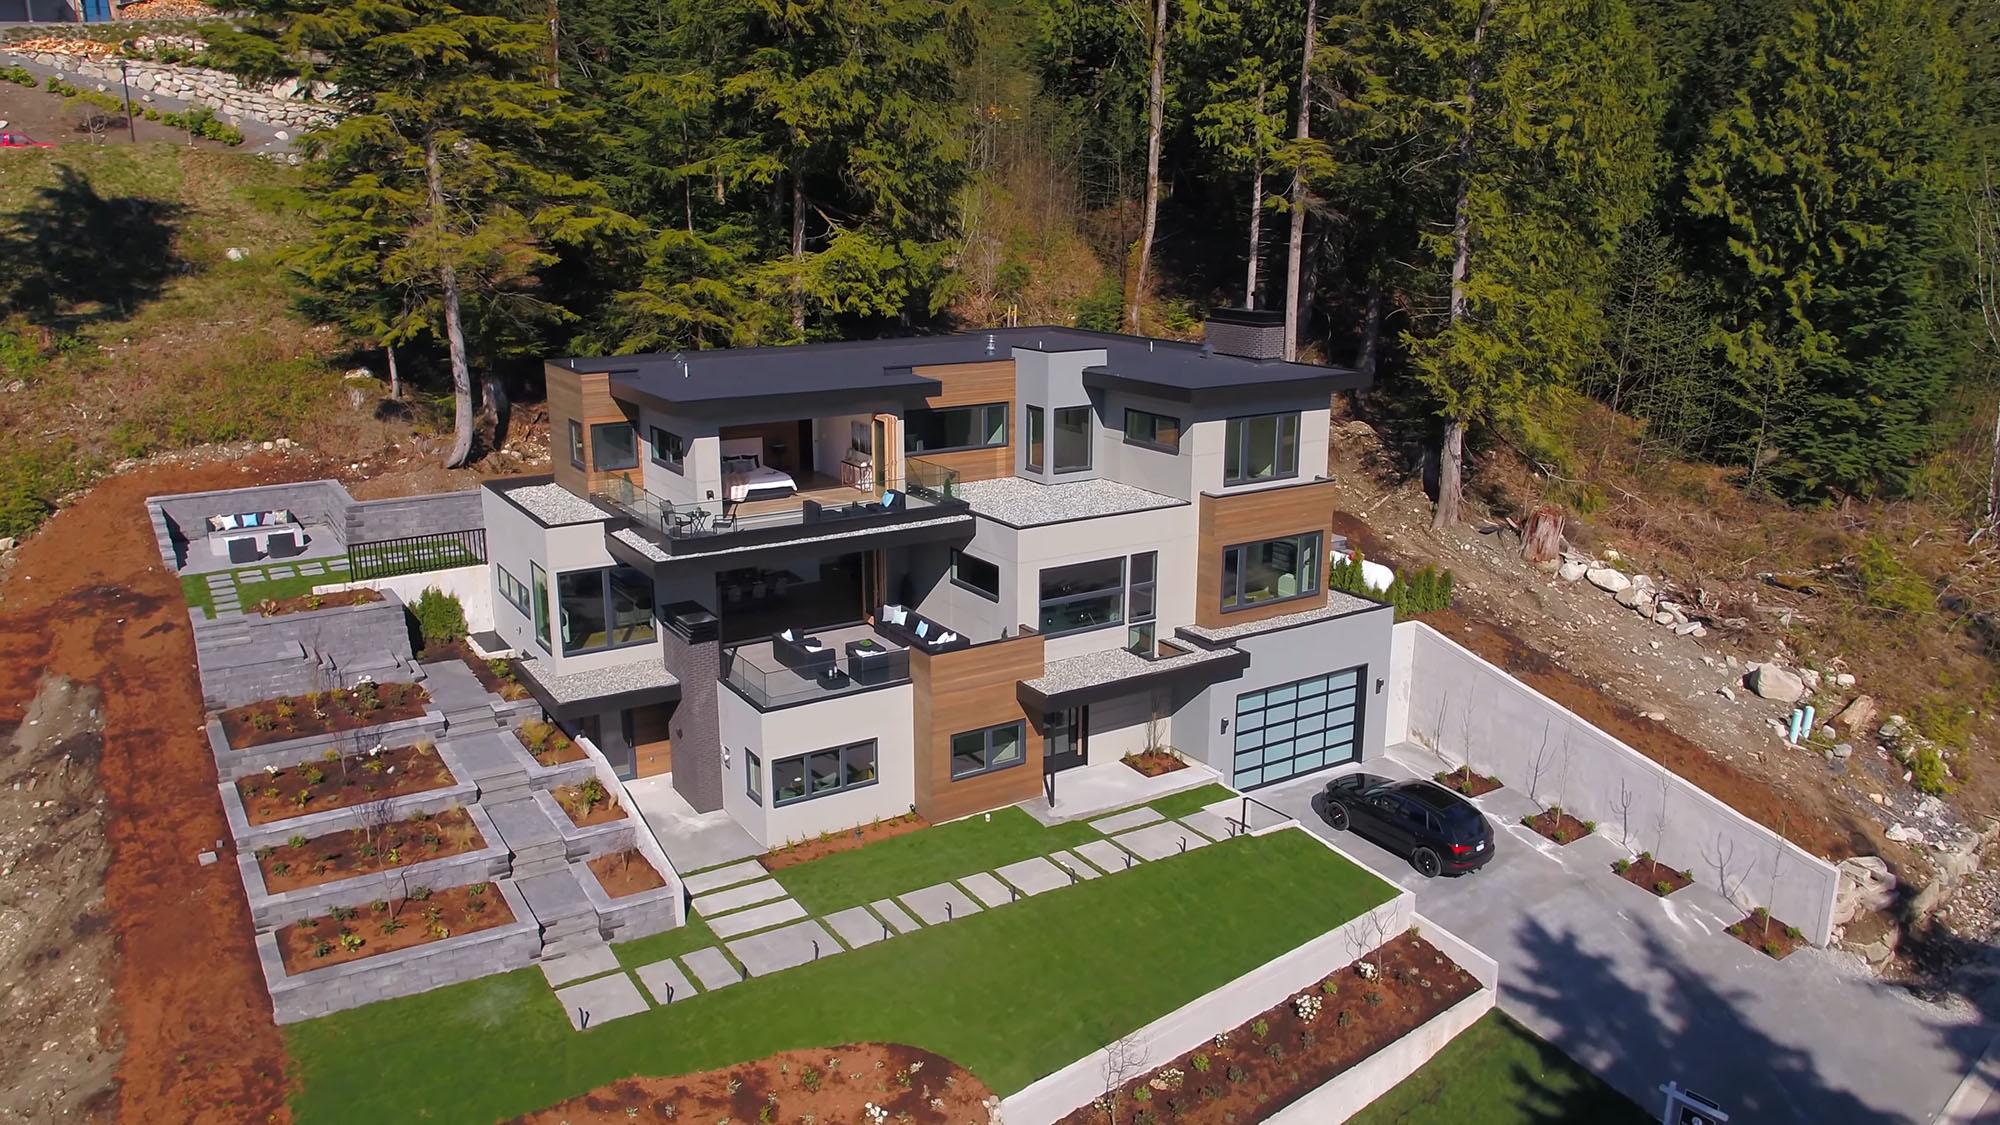 Beautiful custom built modern home using composite decking as siding.